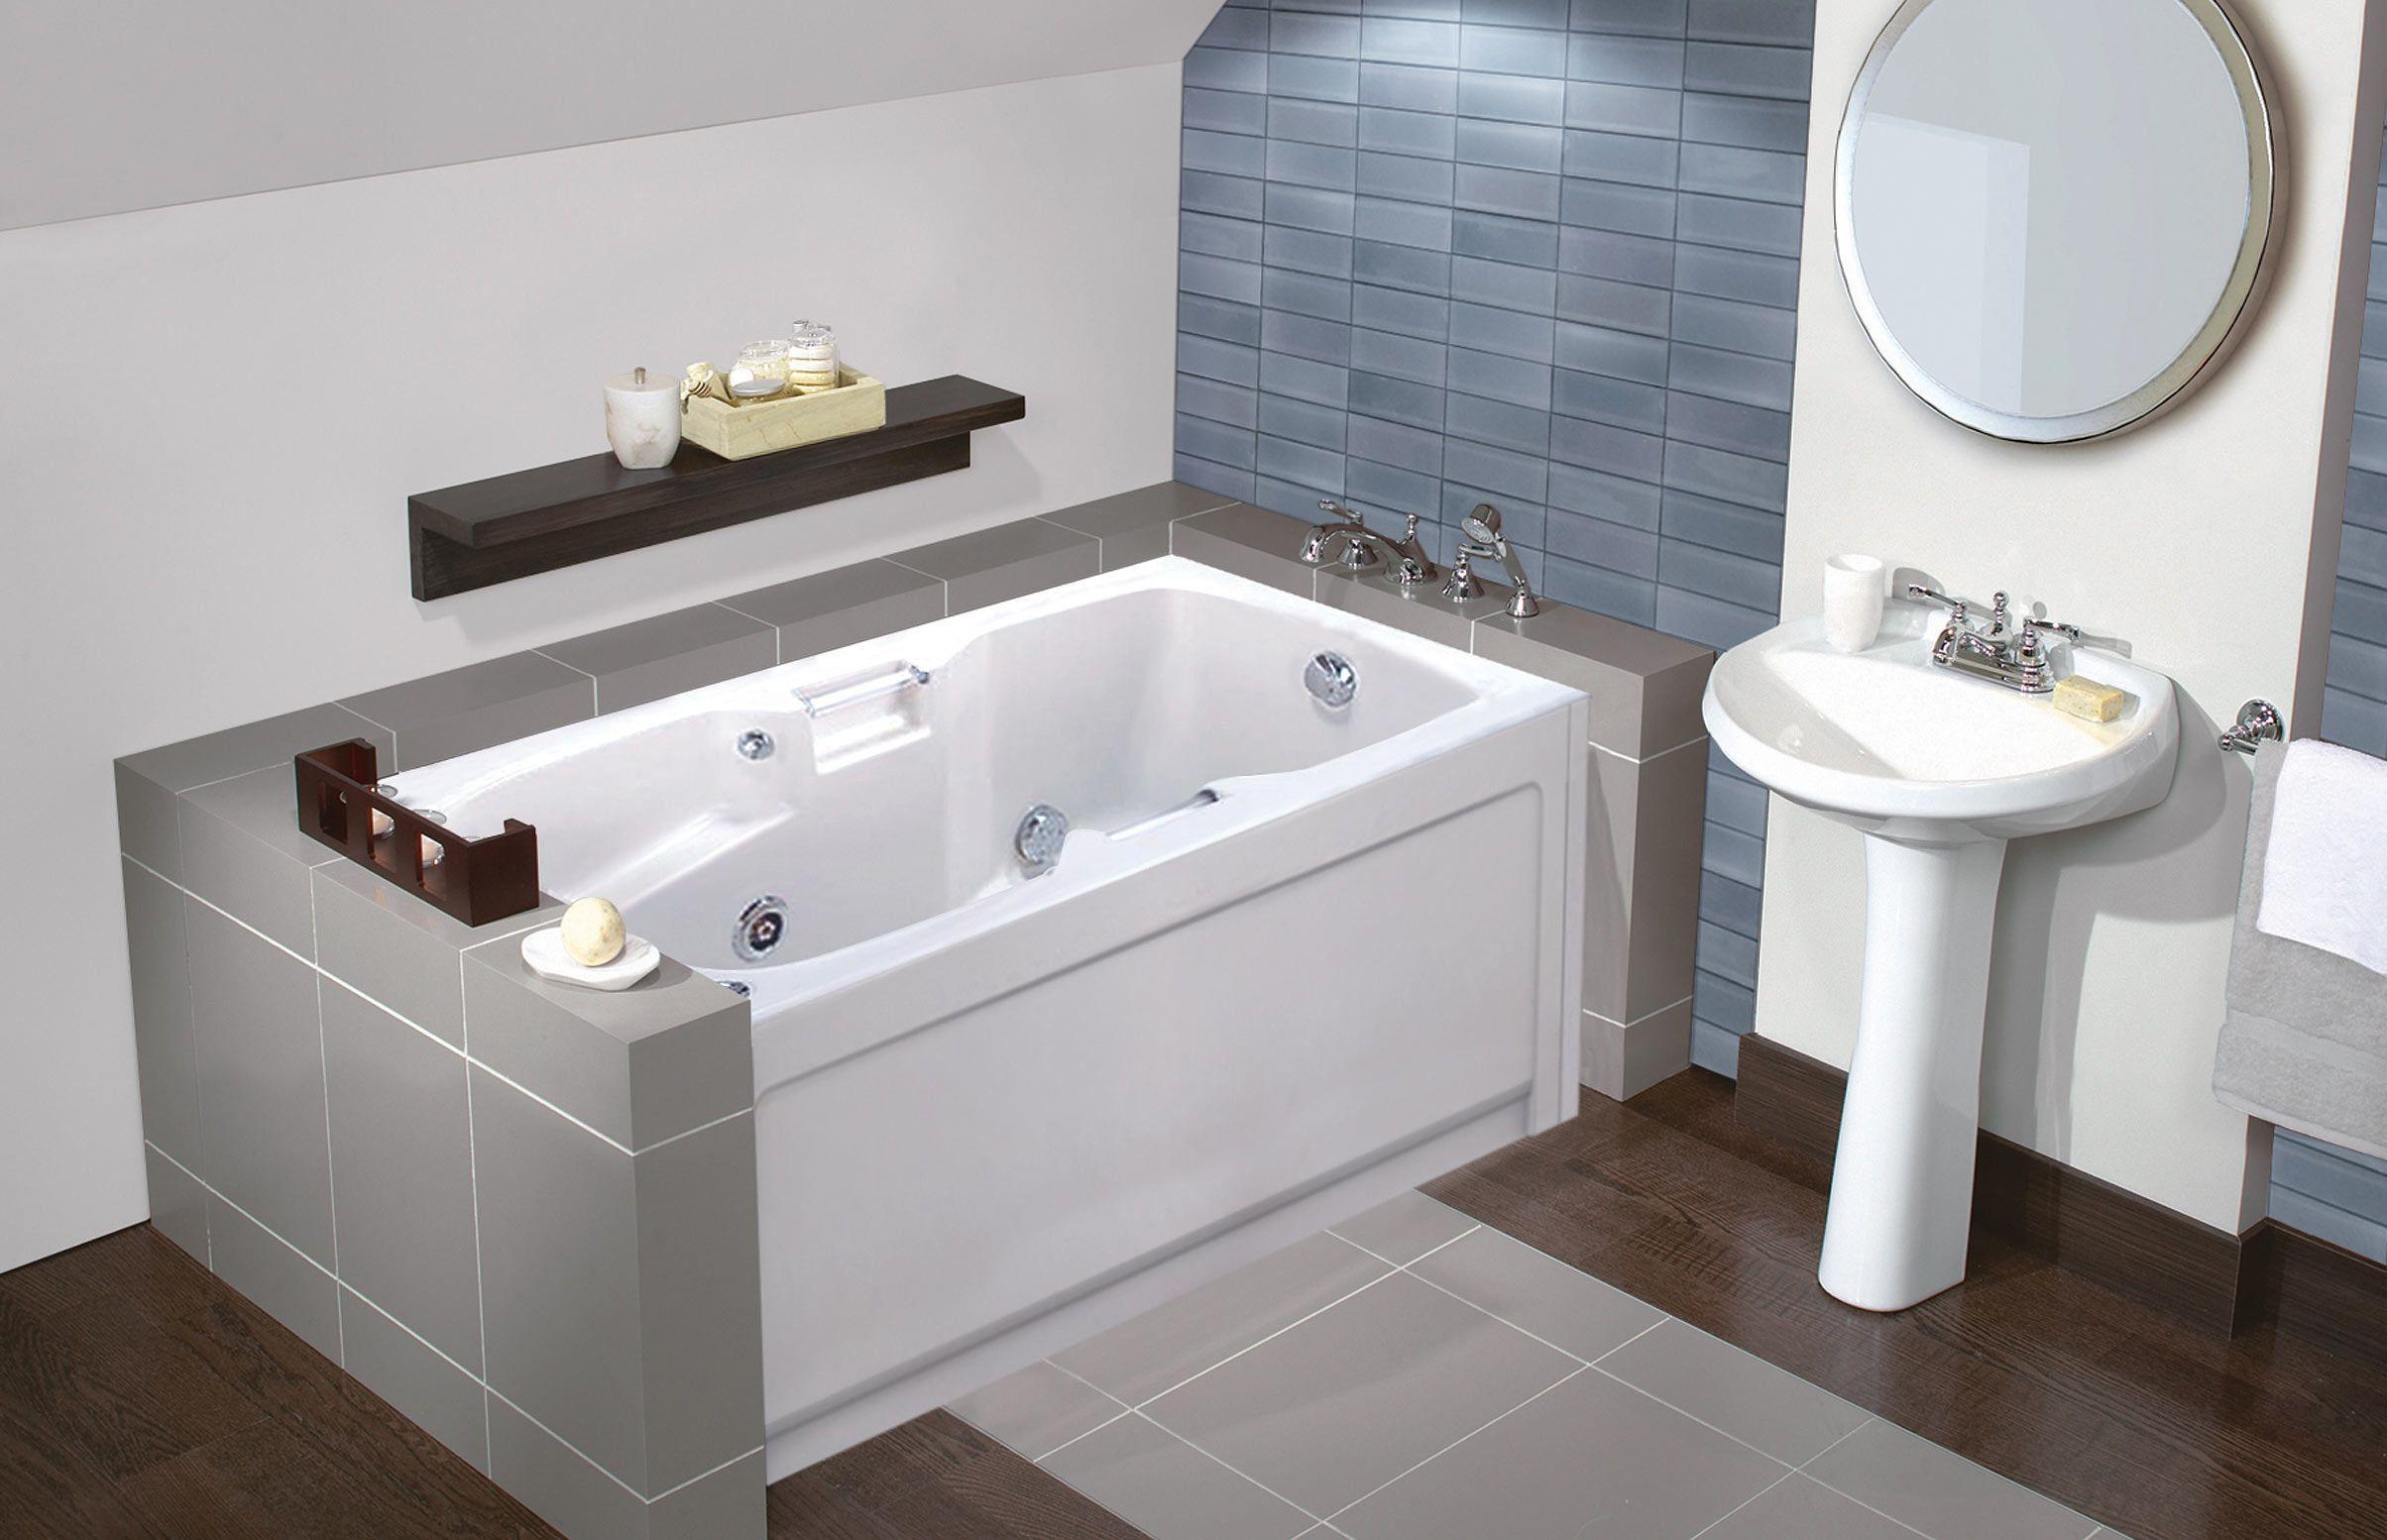 bain camano alc ve ou podium maax professionnel salle de bain pinterest bathtubs alcove. Black Bedroom Furniture Sets. Home Design Ideas